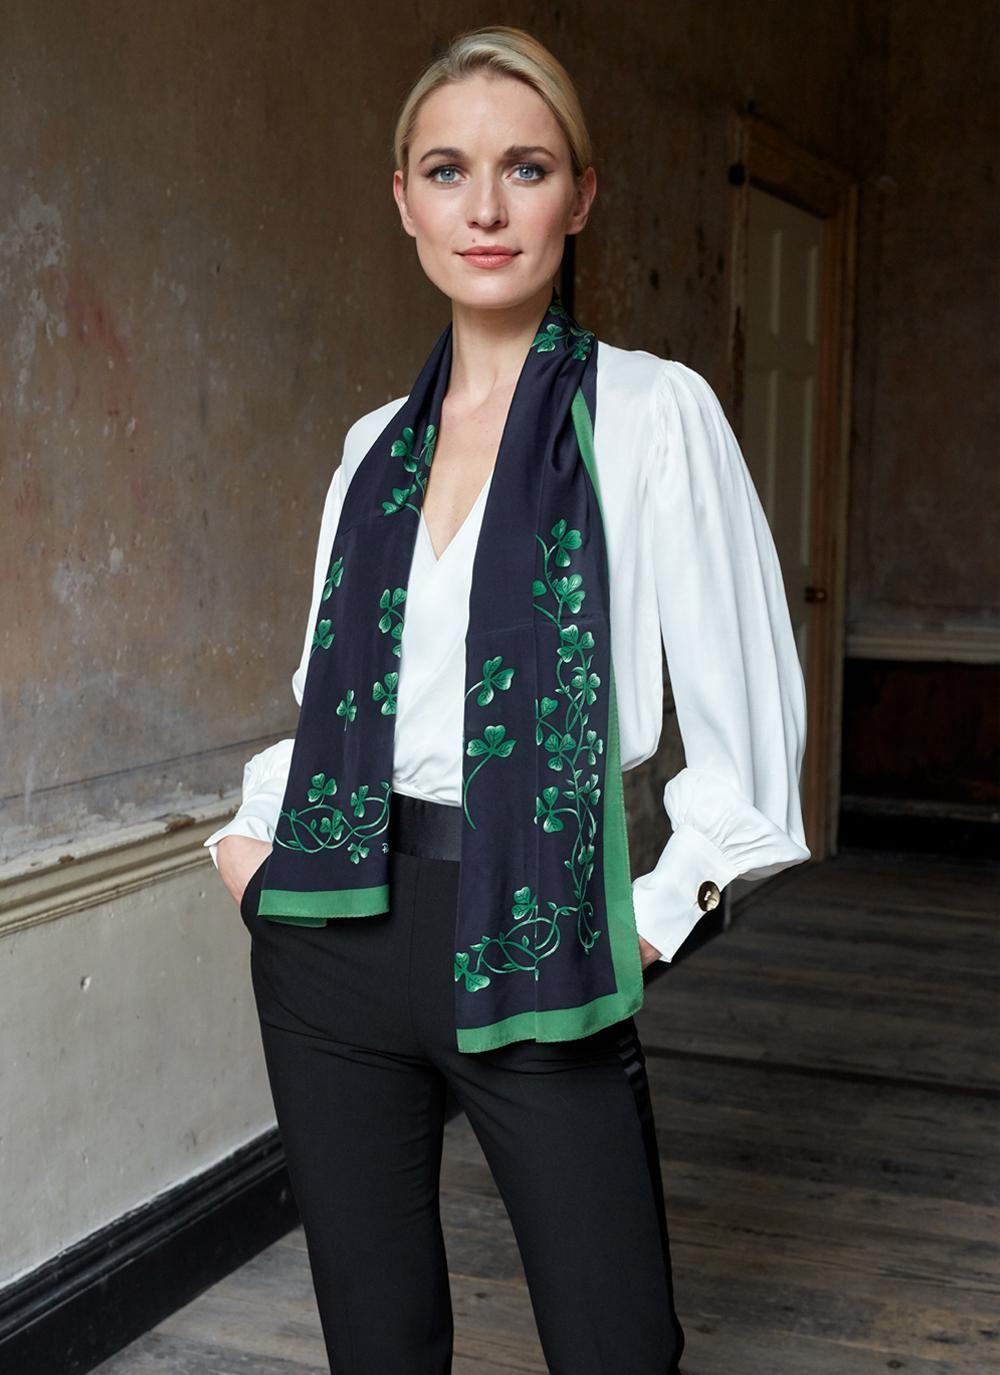 24072e0560e143 Shamrock Silk Scarf #shamrock #silkscarf #ireland #dublin #gifts  #irishgifts #irish #stpatricksday #breretonjewellers #thingstoseeinireland  #irelandvaction ...